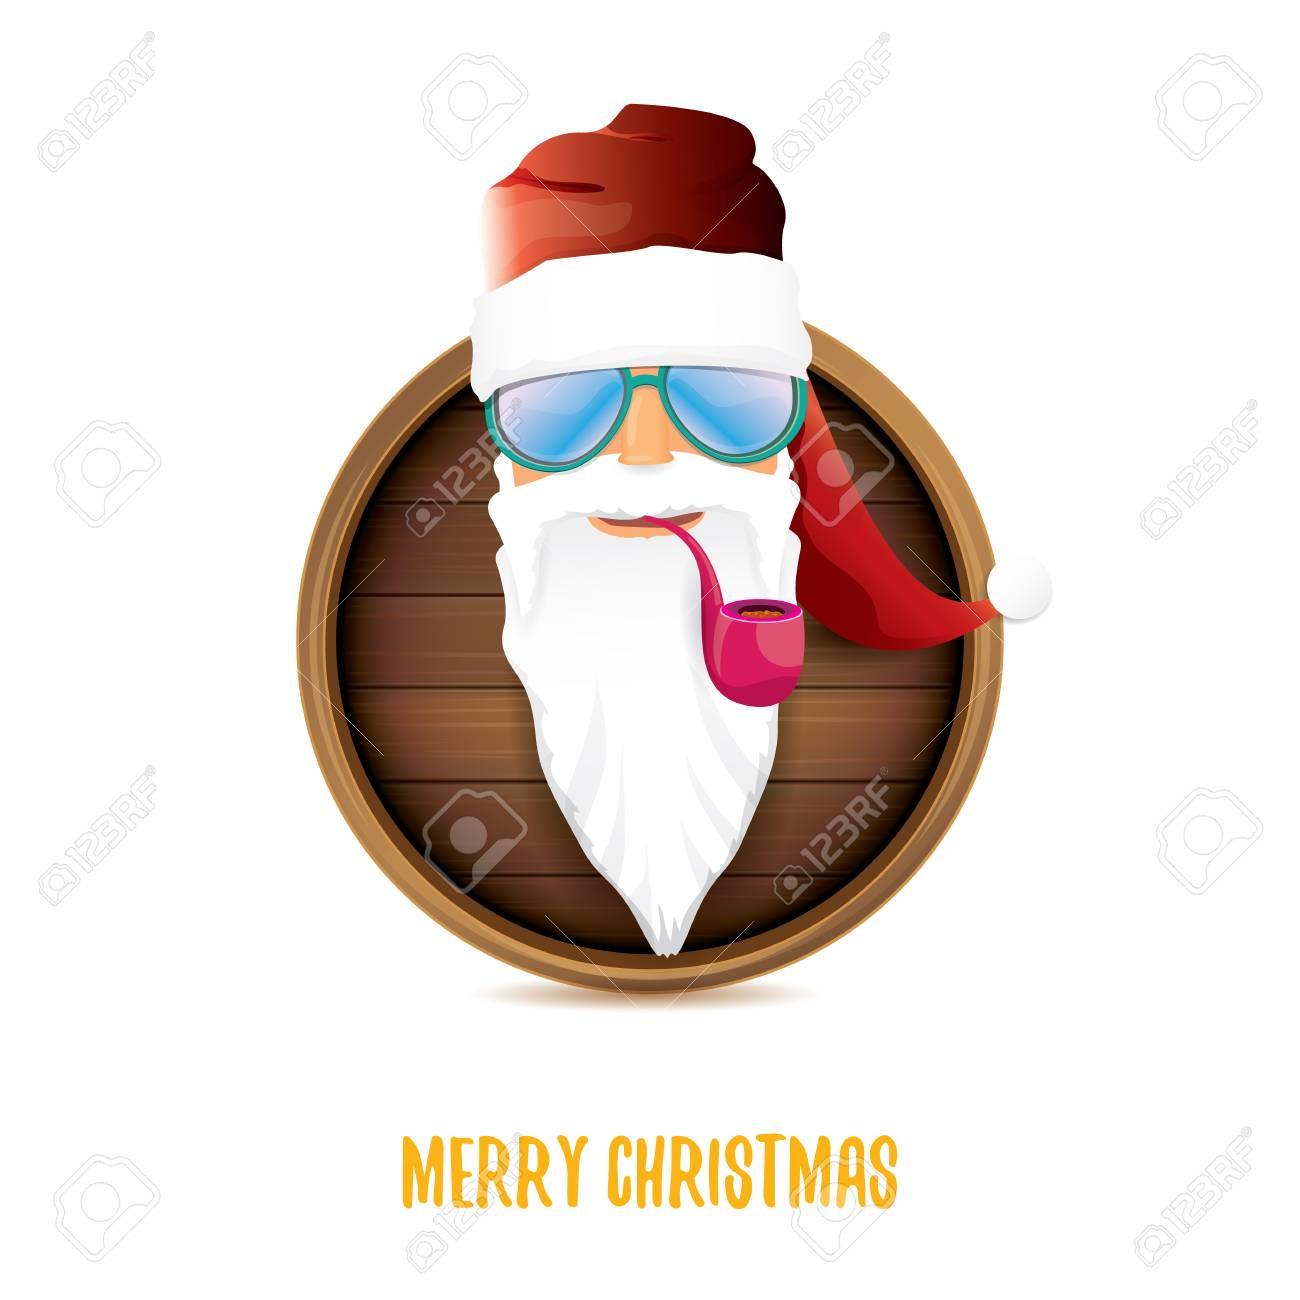 vector bad rock n roll dj santa claus with smoking pipe, funky